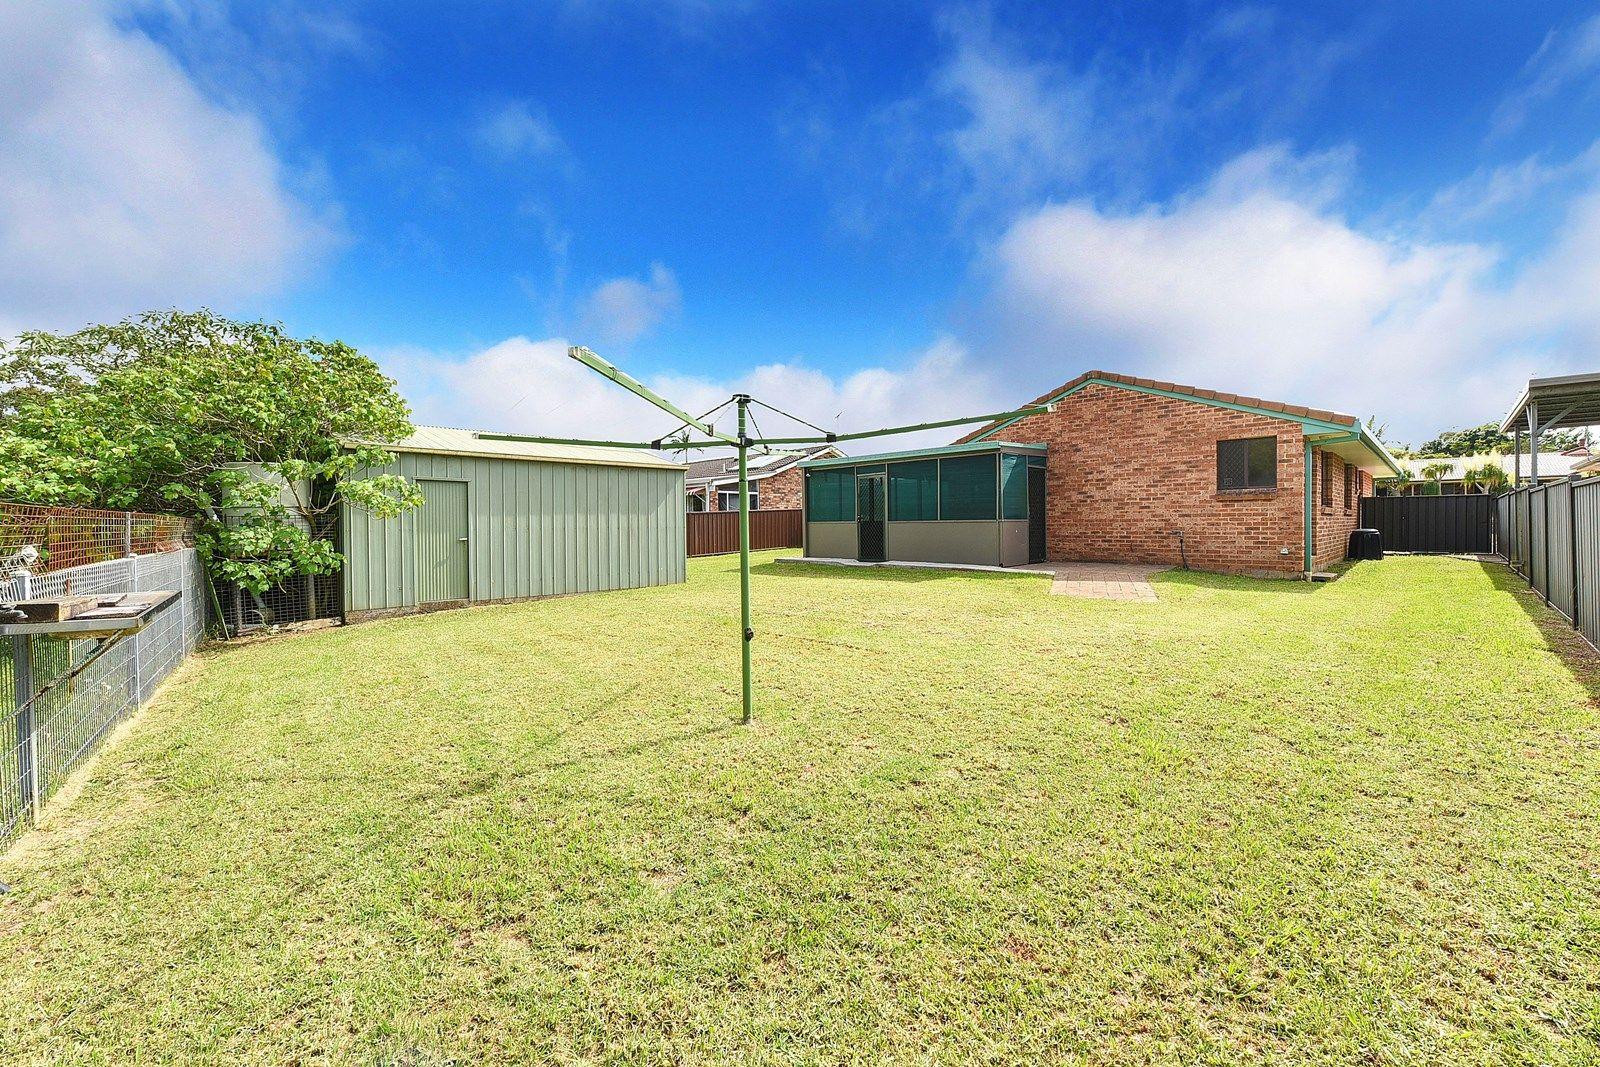 45 The Jib, Port Macquarie NSW 2444, Image 1